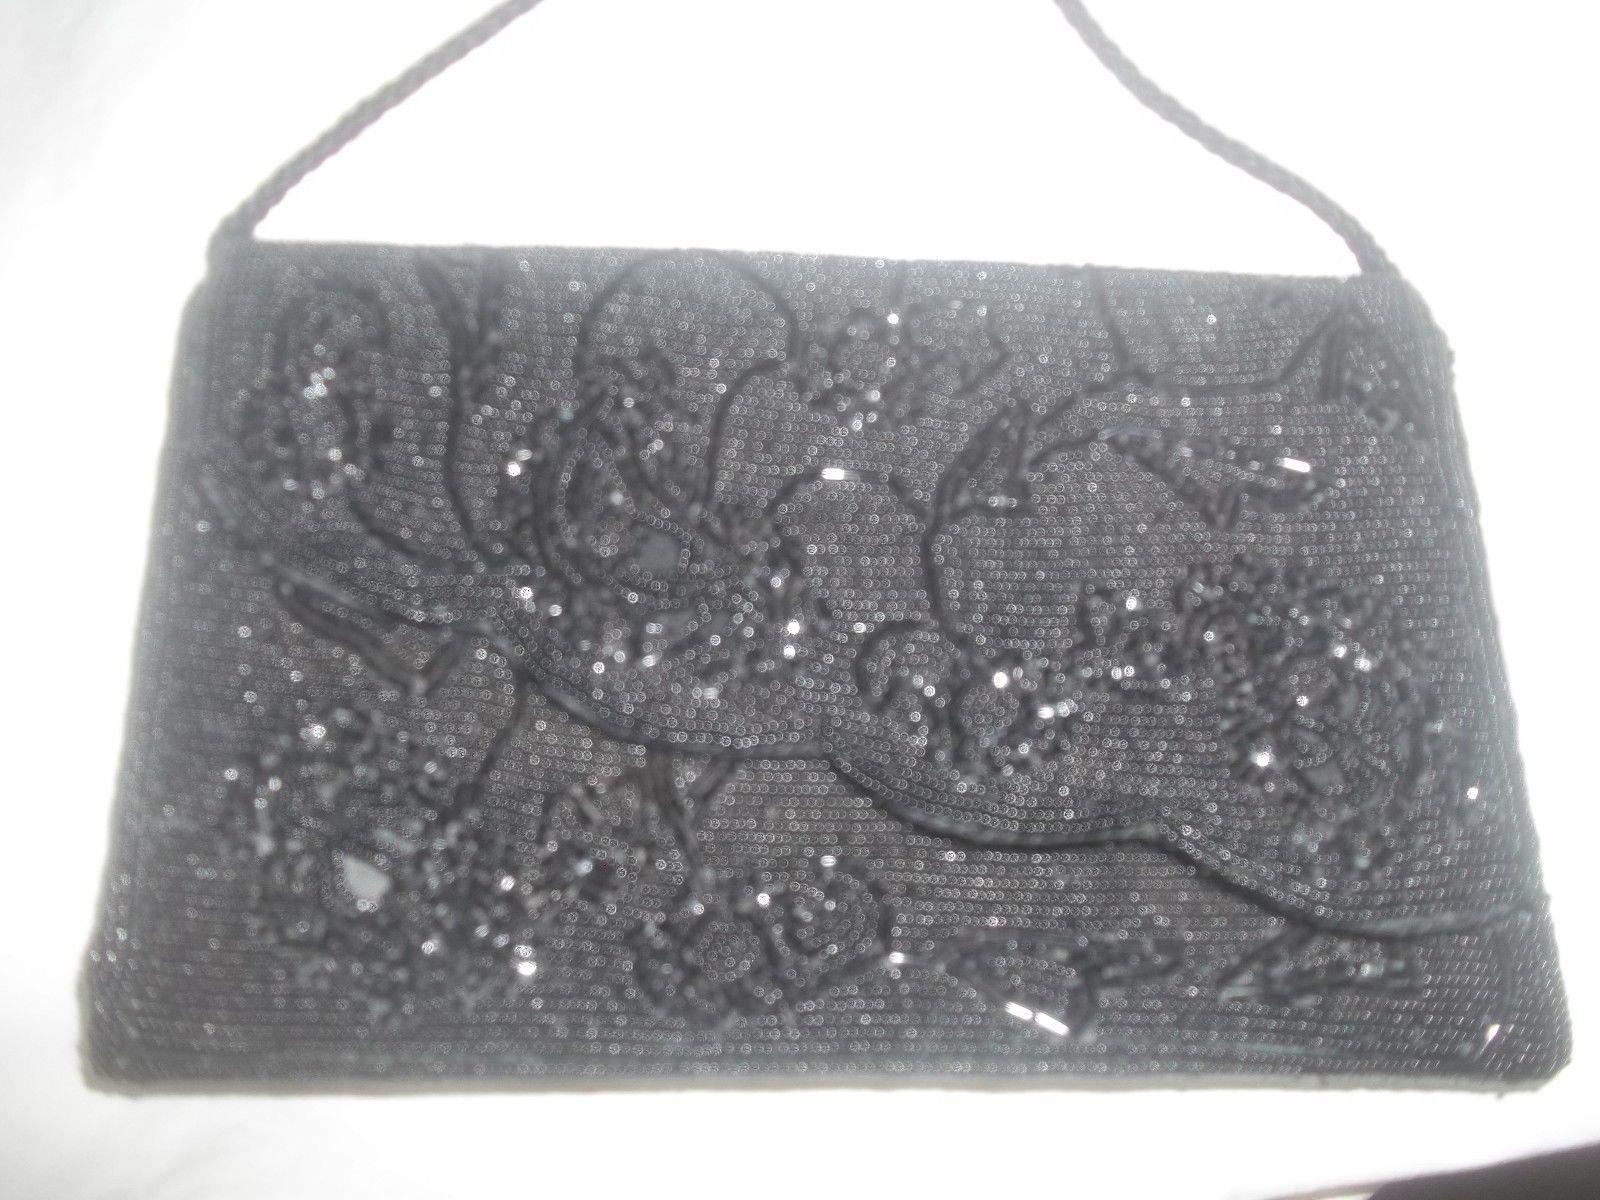 Vintage Black Beaded Clutch Handbag Purse 24 74